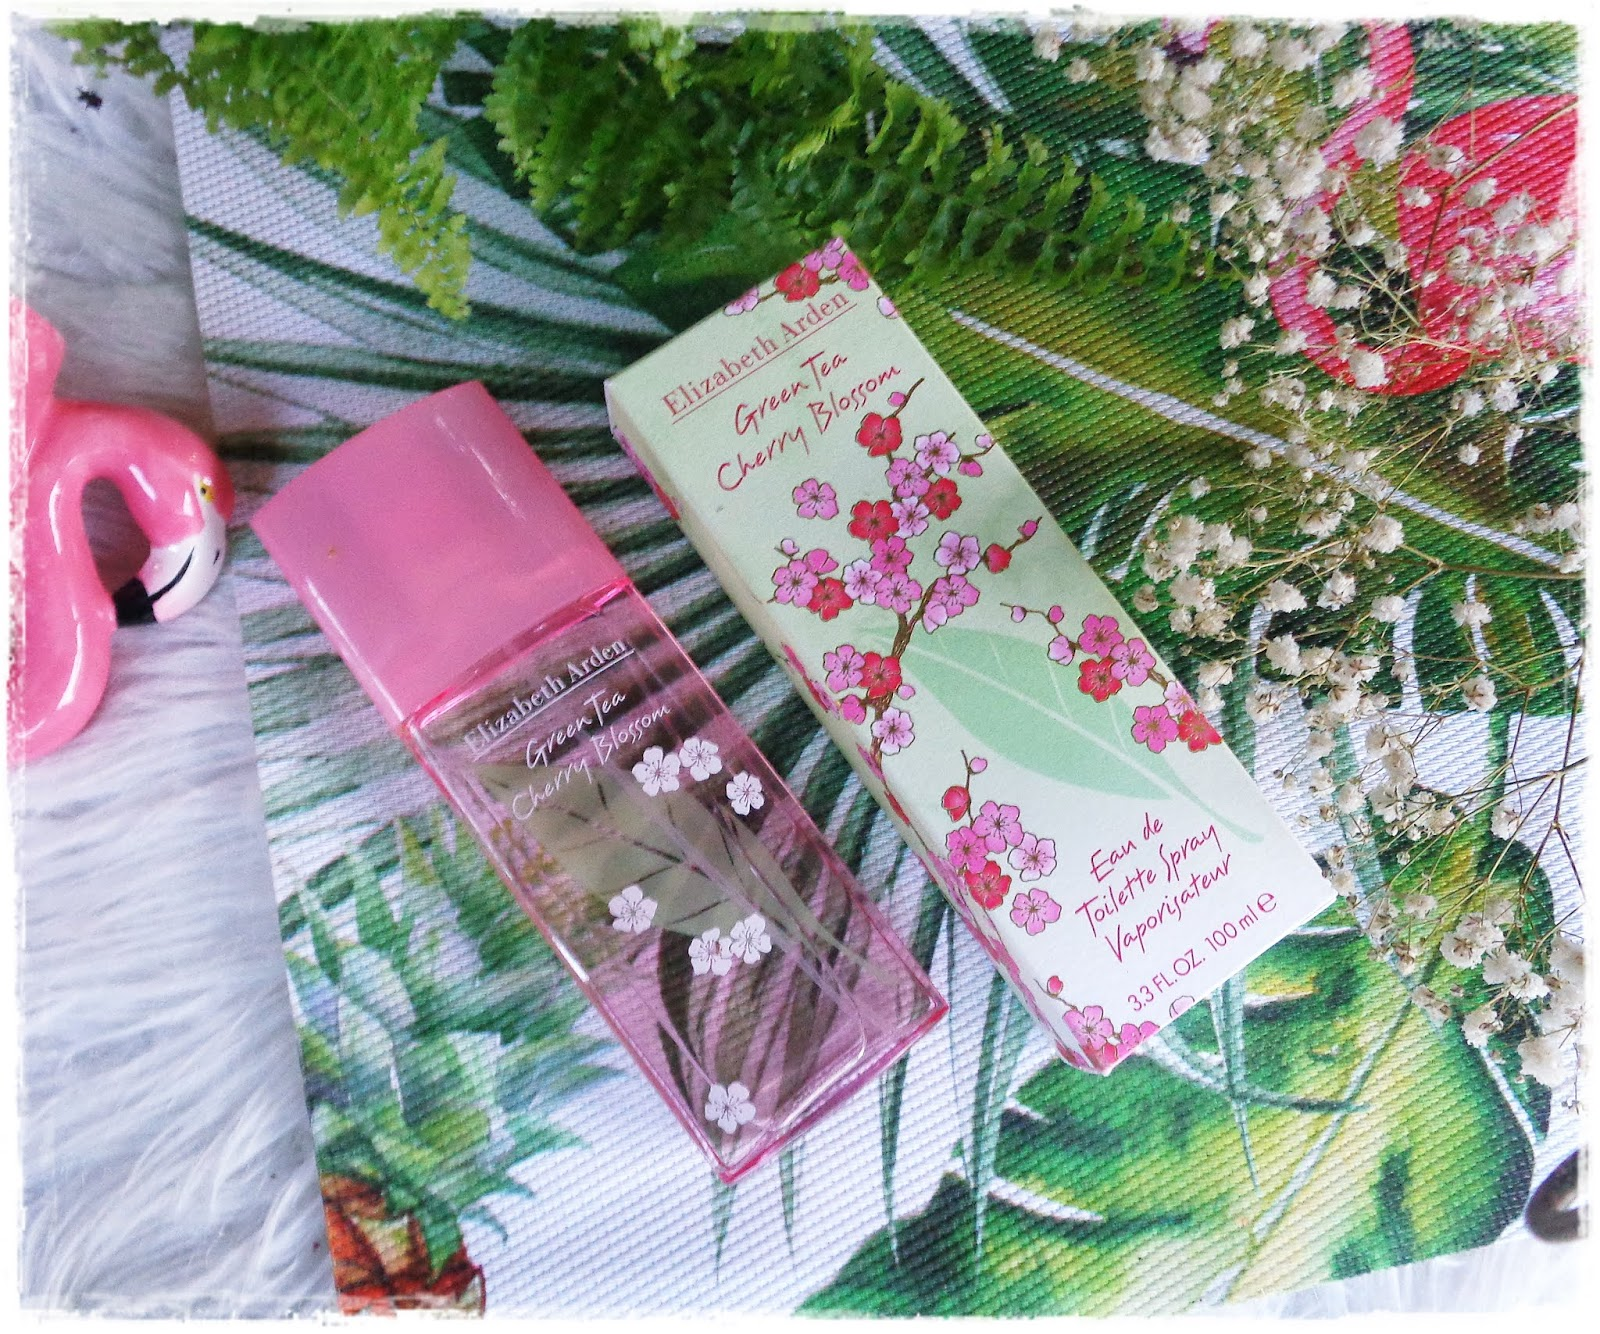 Elizabeth Arden, Green Tea Cherry Blossom, Zapach Idealny na Wiosnę i Lato